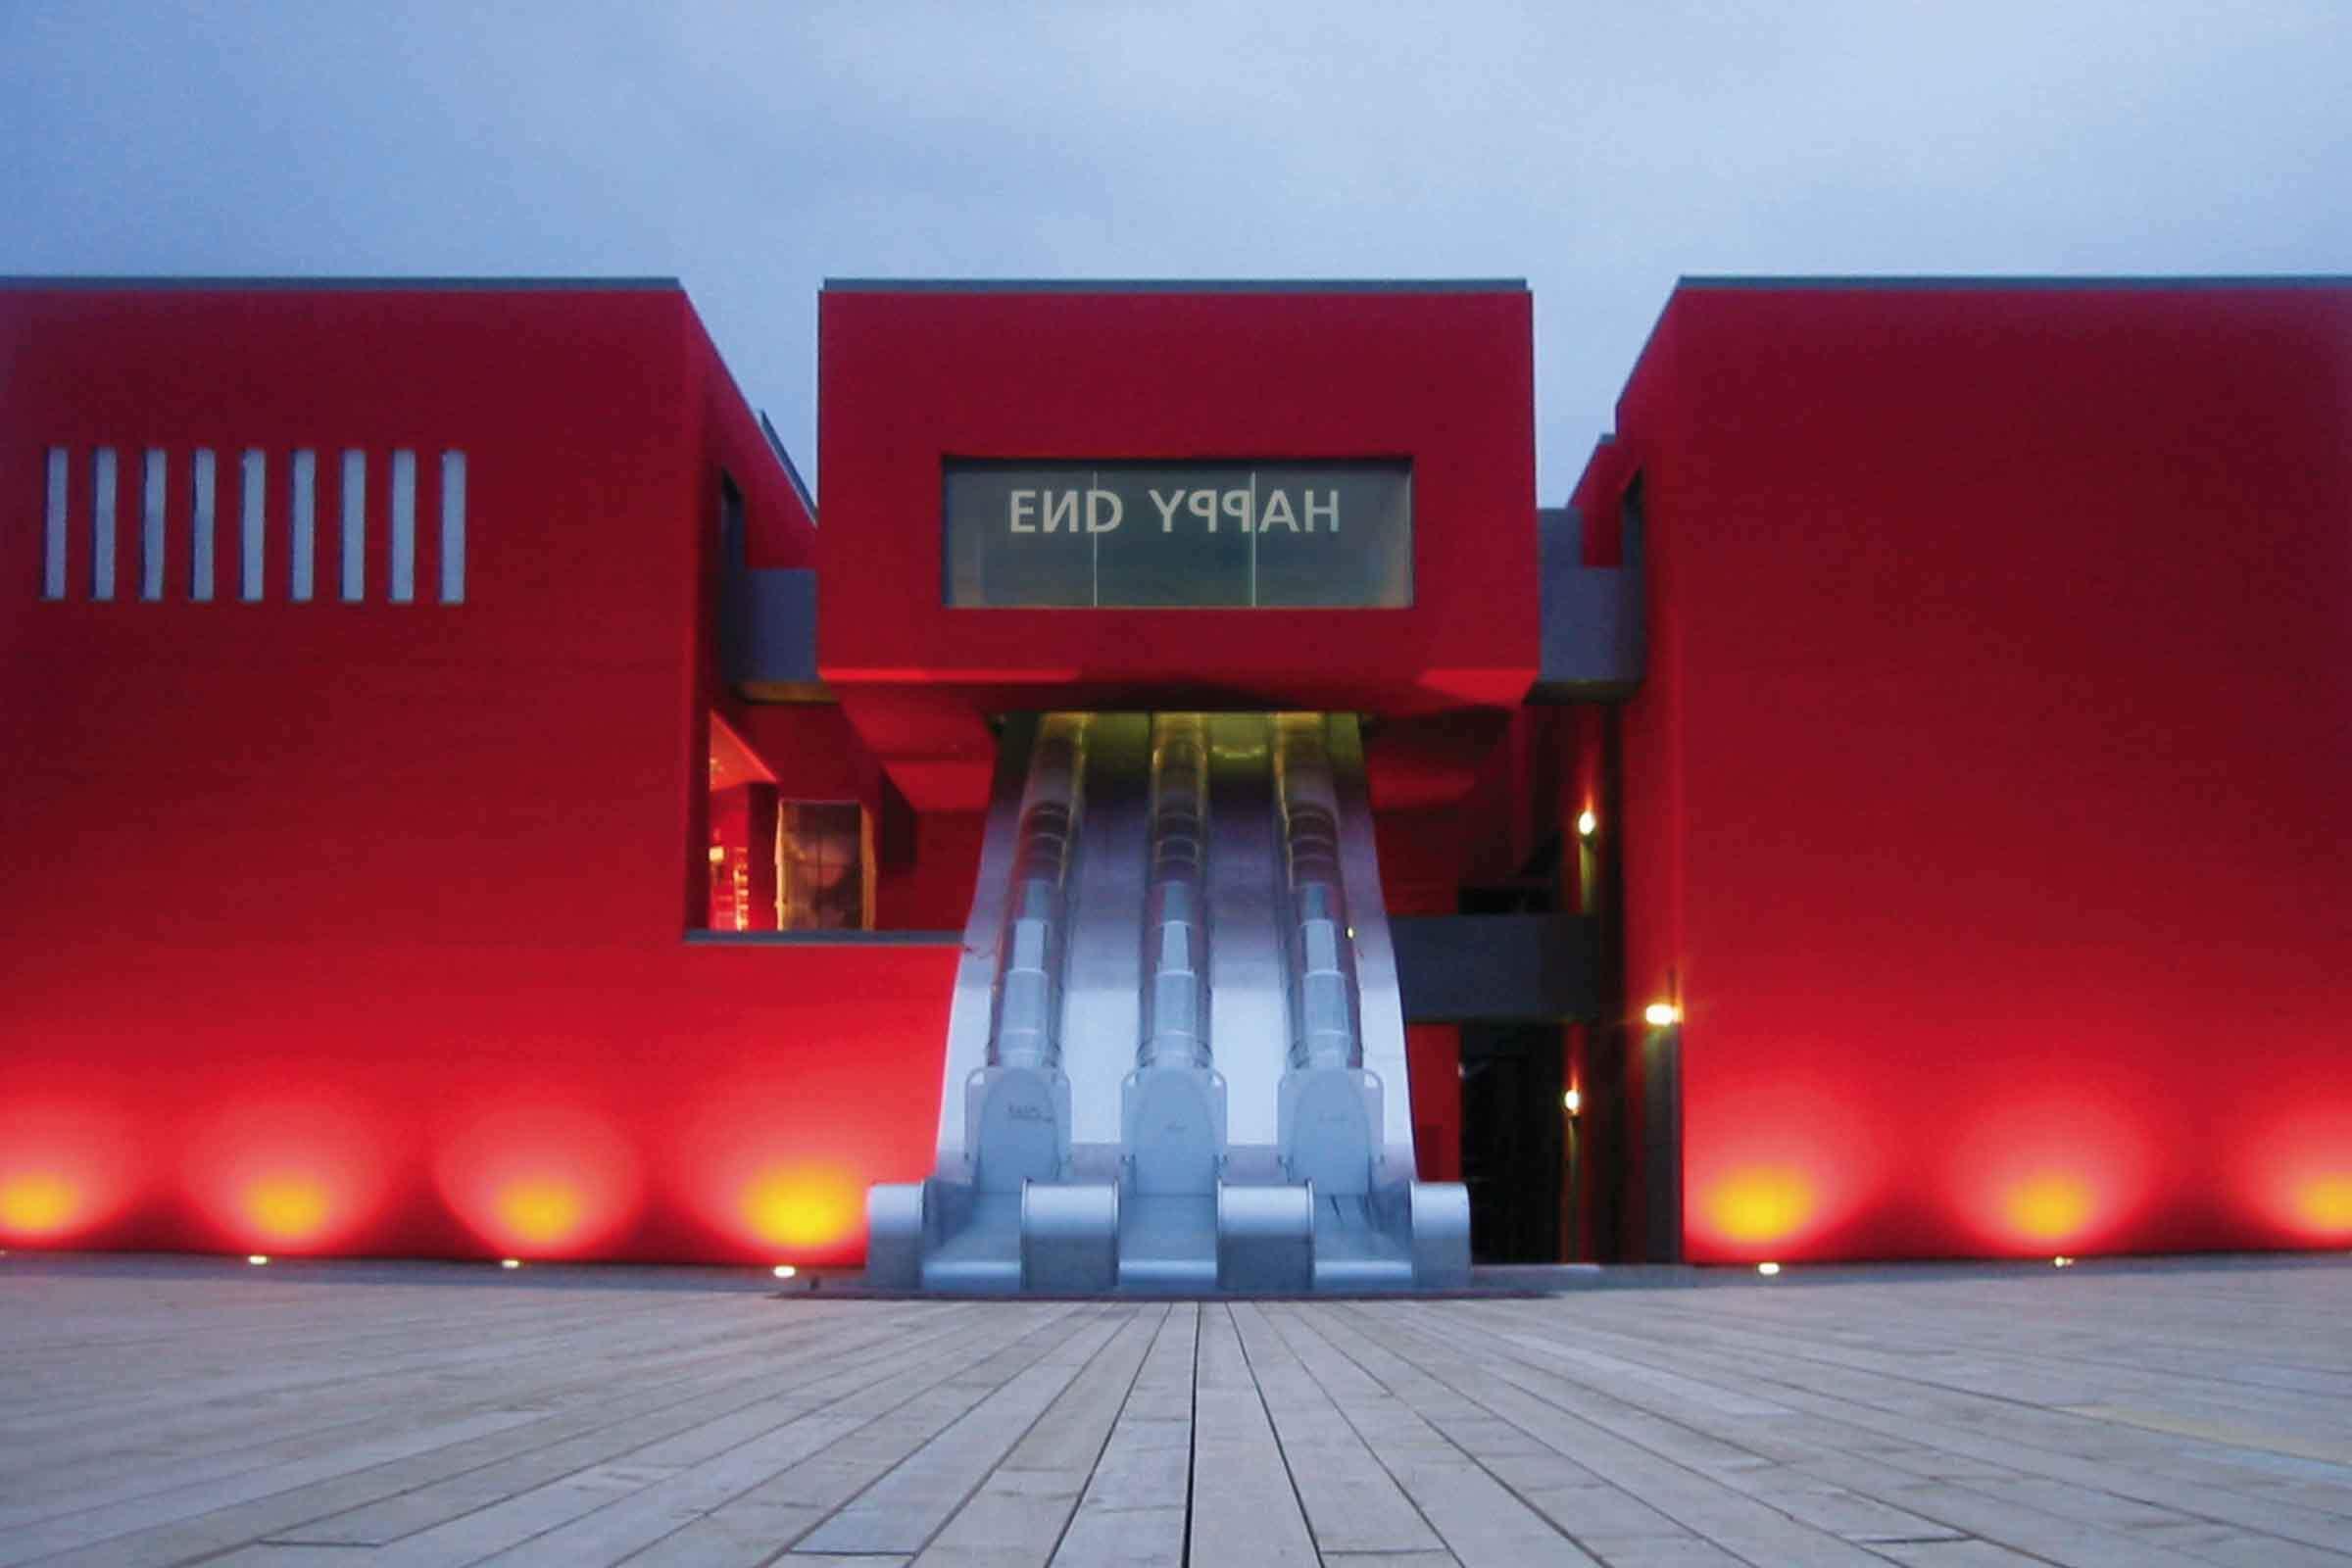 Themenpark umgesetzt von Expomondo